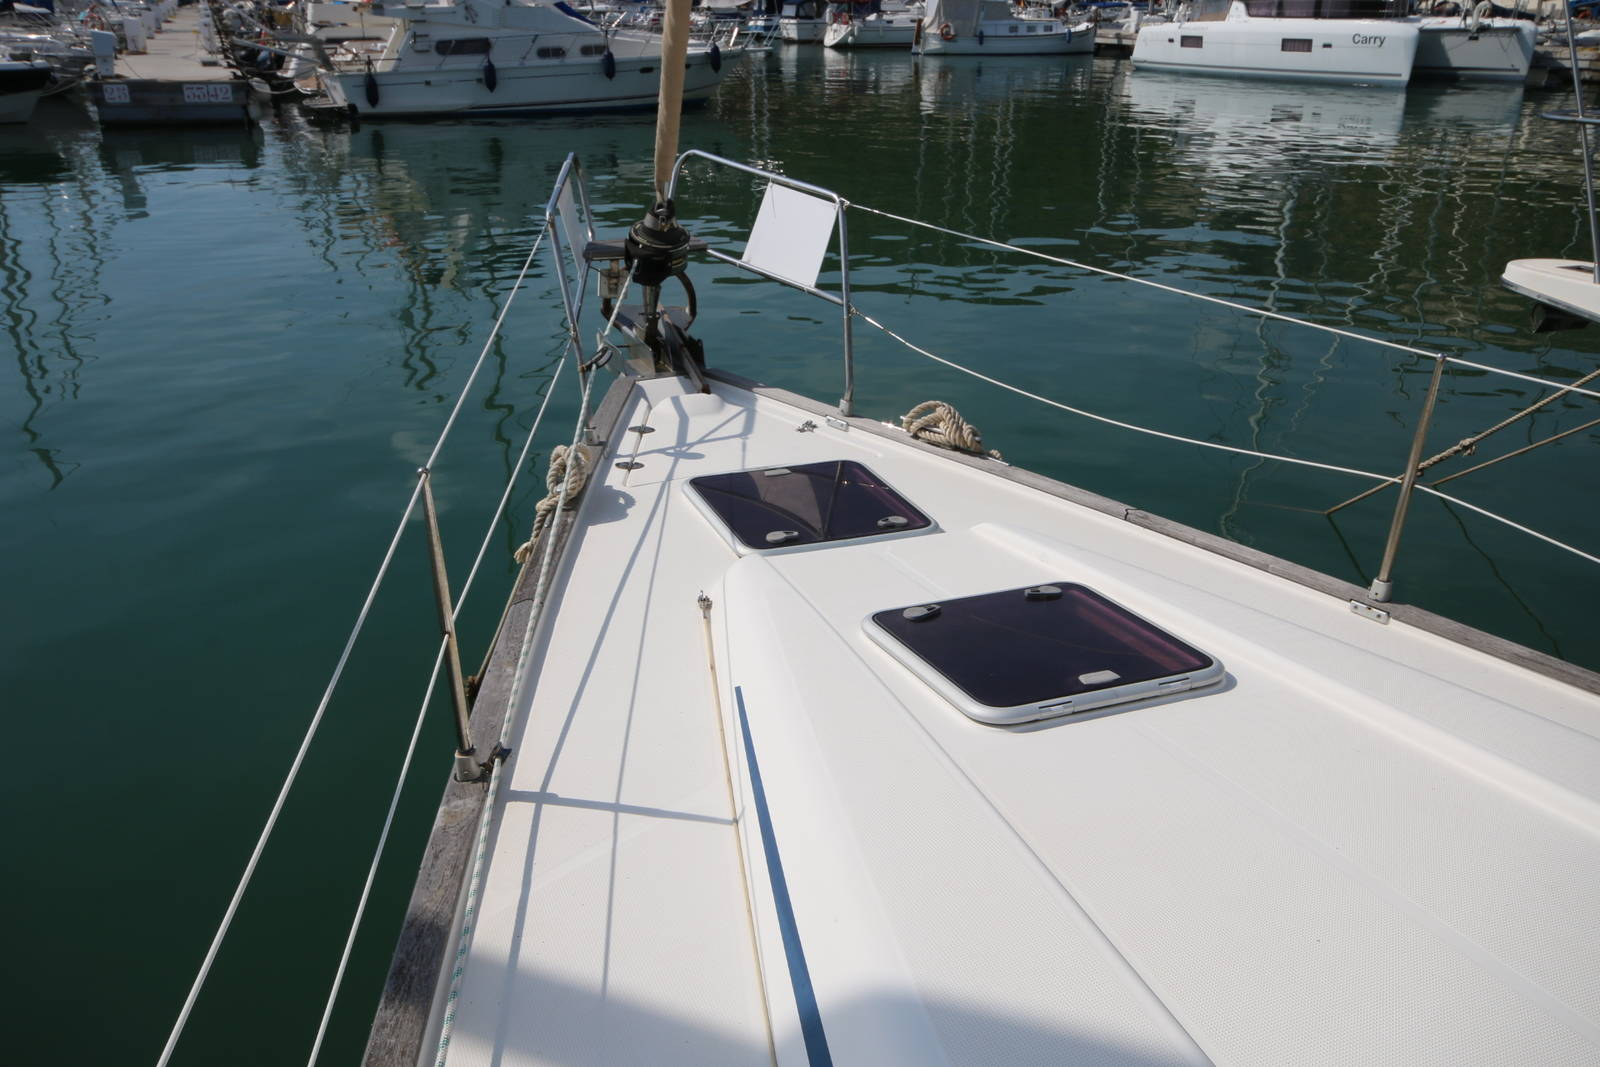 Bavaria 46 Yacht Deck on Boat 4